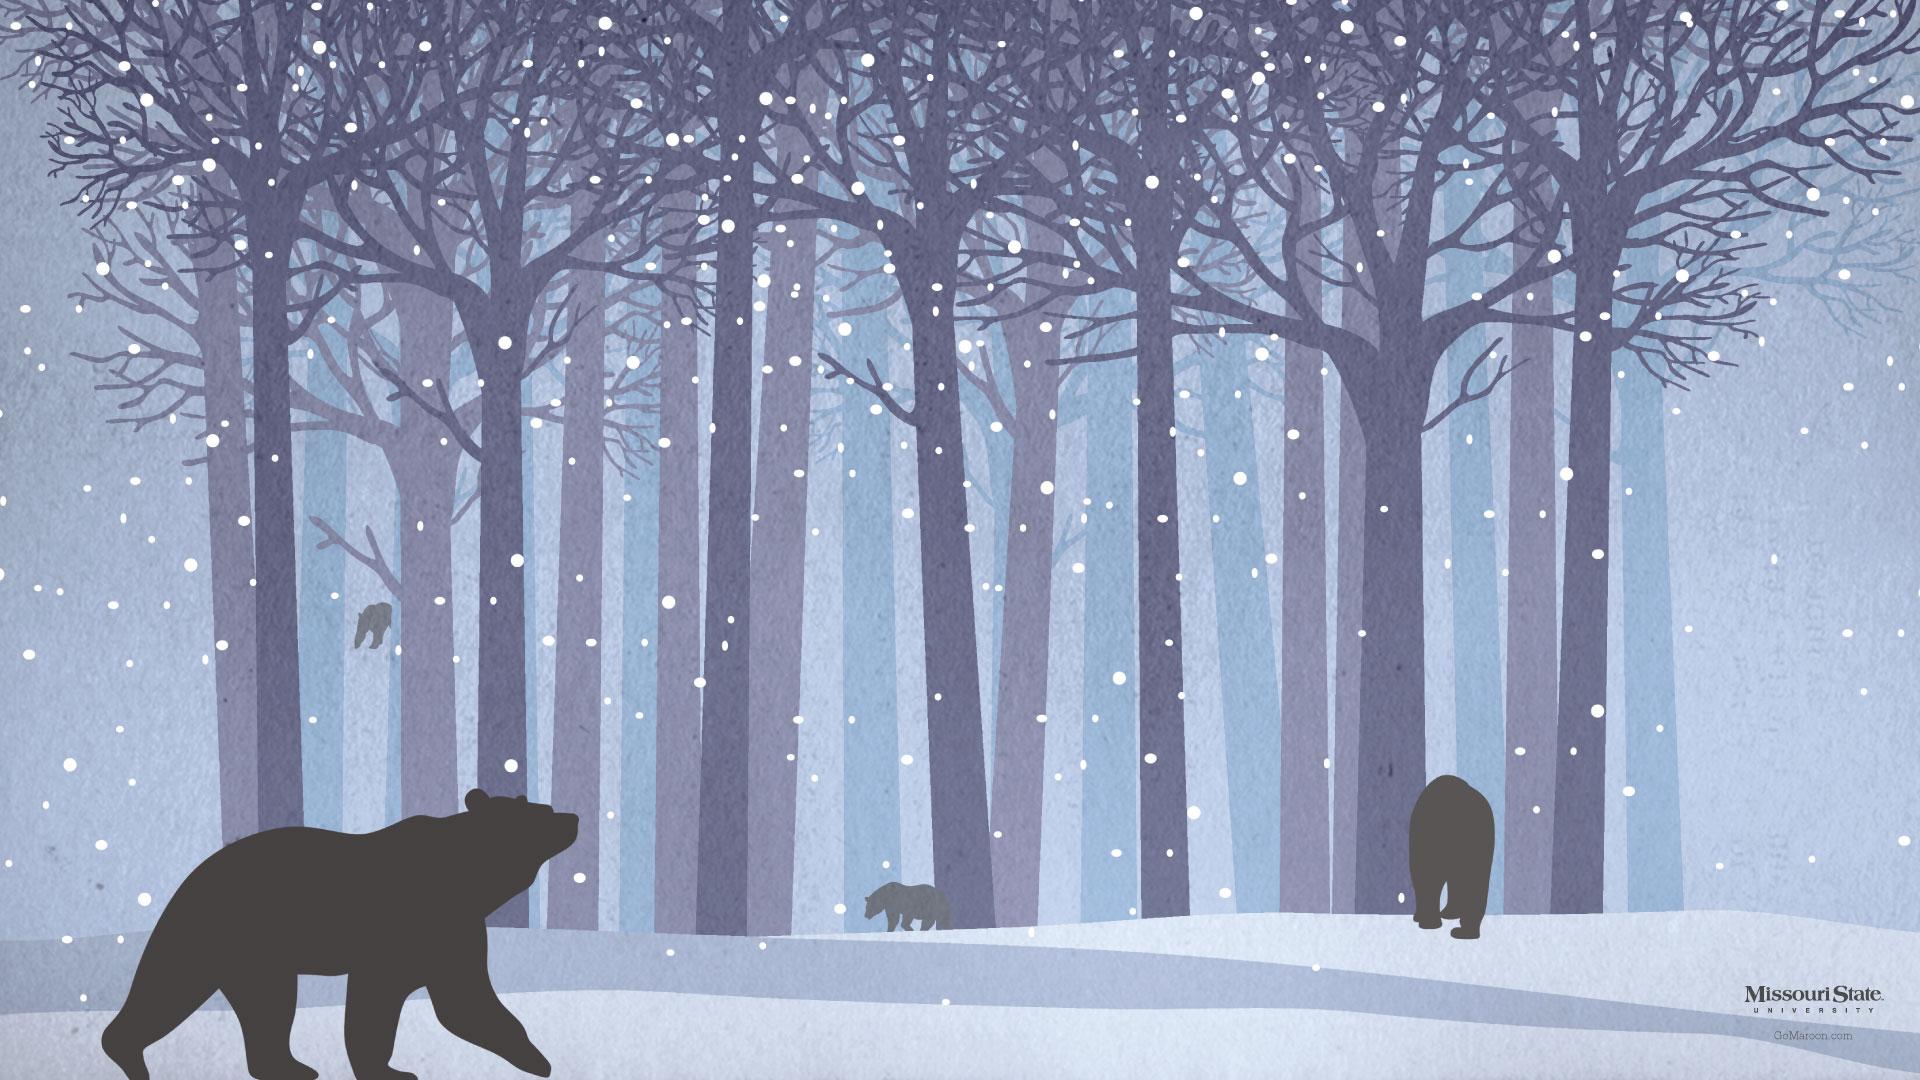 Disney Cartoon Wallpaper 1600x1200 | ??Trees?   | Pinterest ...